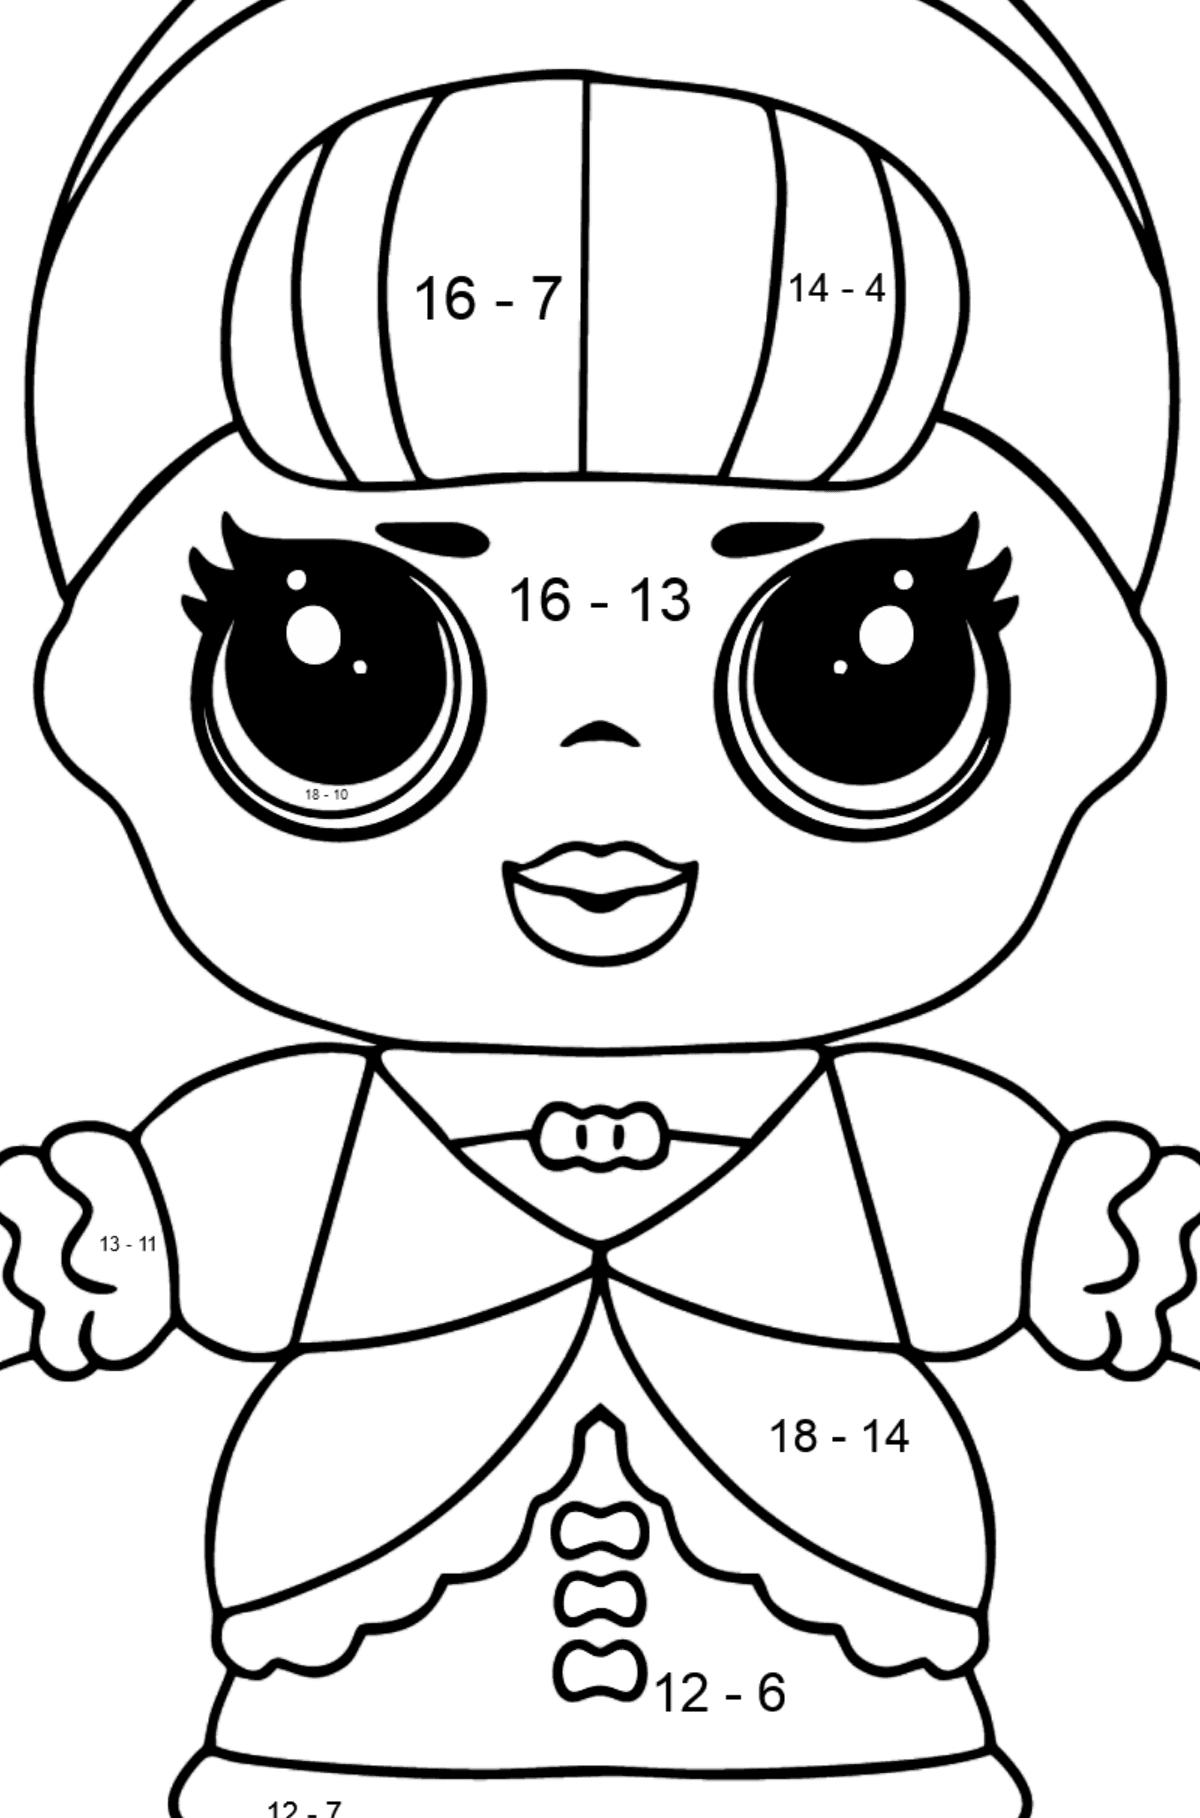 L.O.L. Surprise Doll Fancy - Math Coloring - Subtraction for Kids